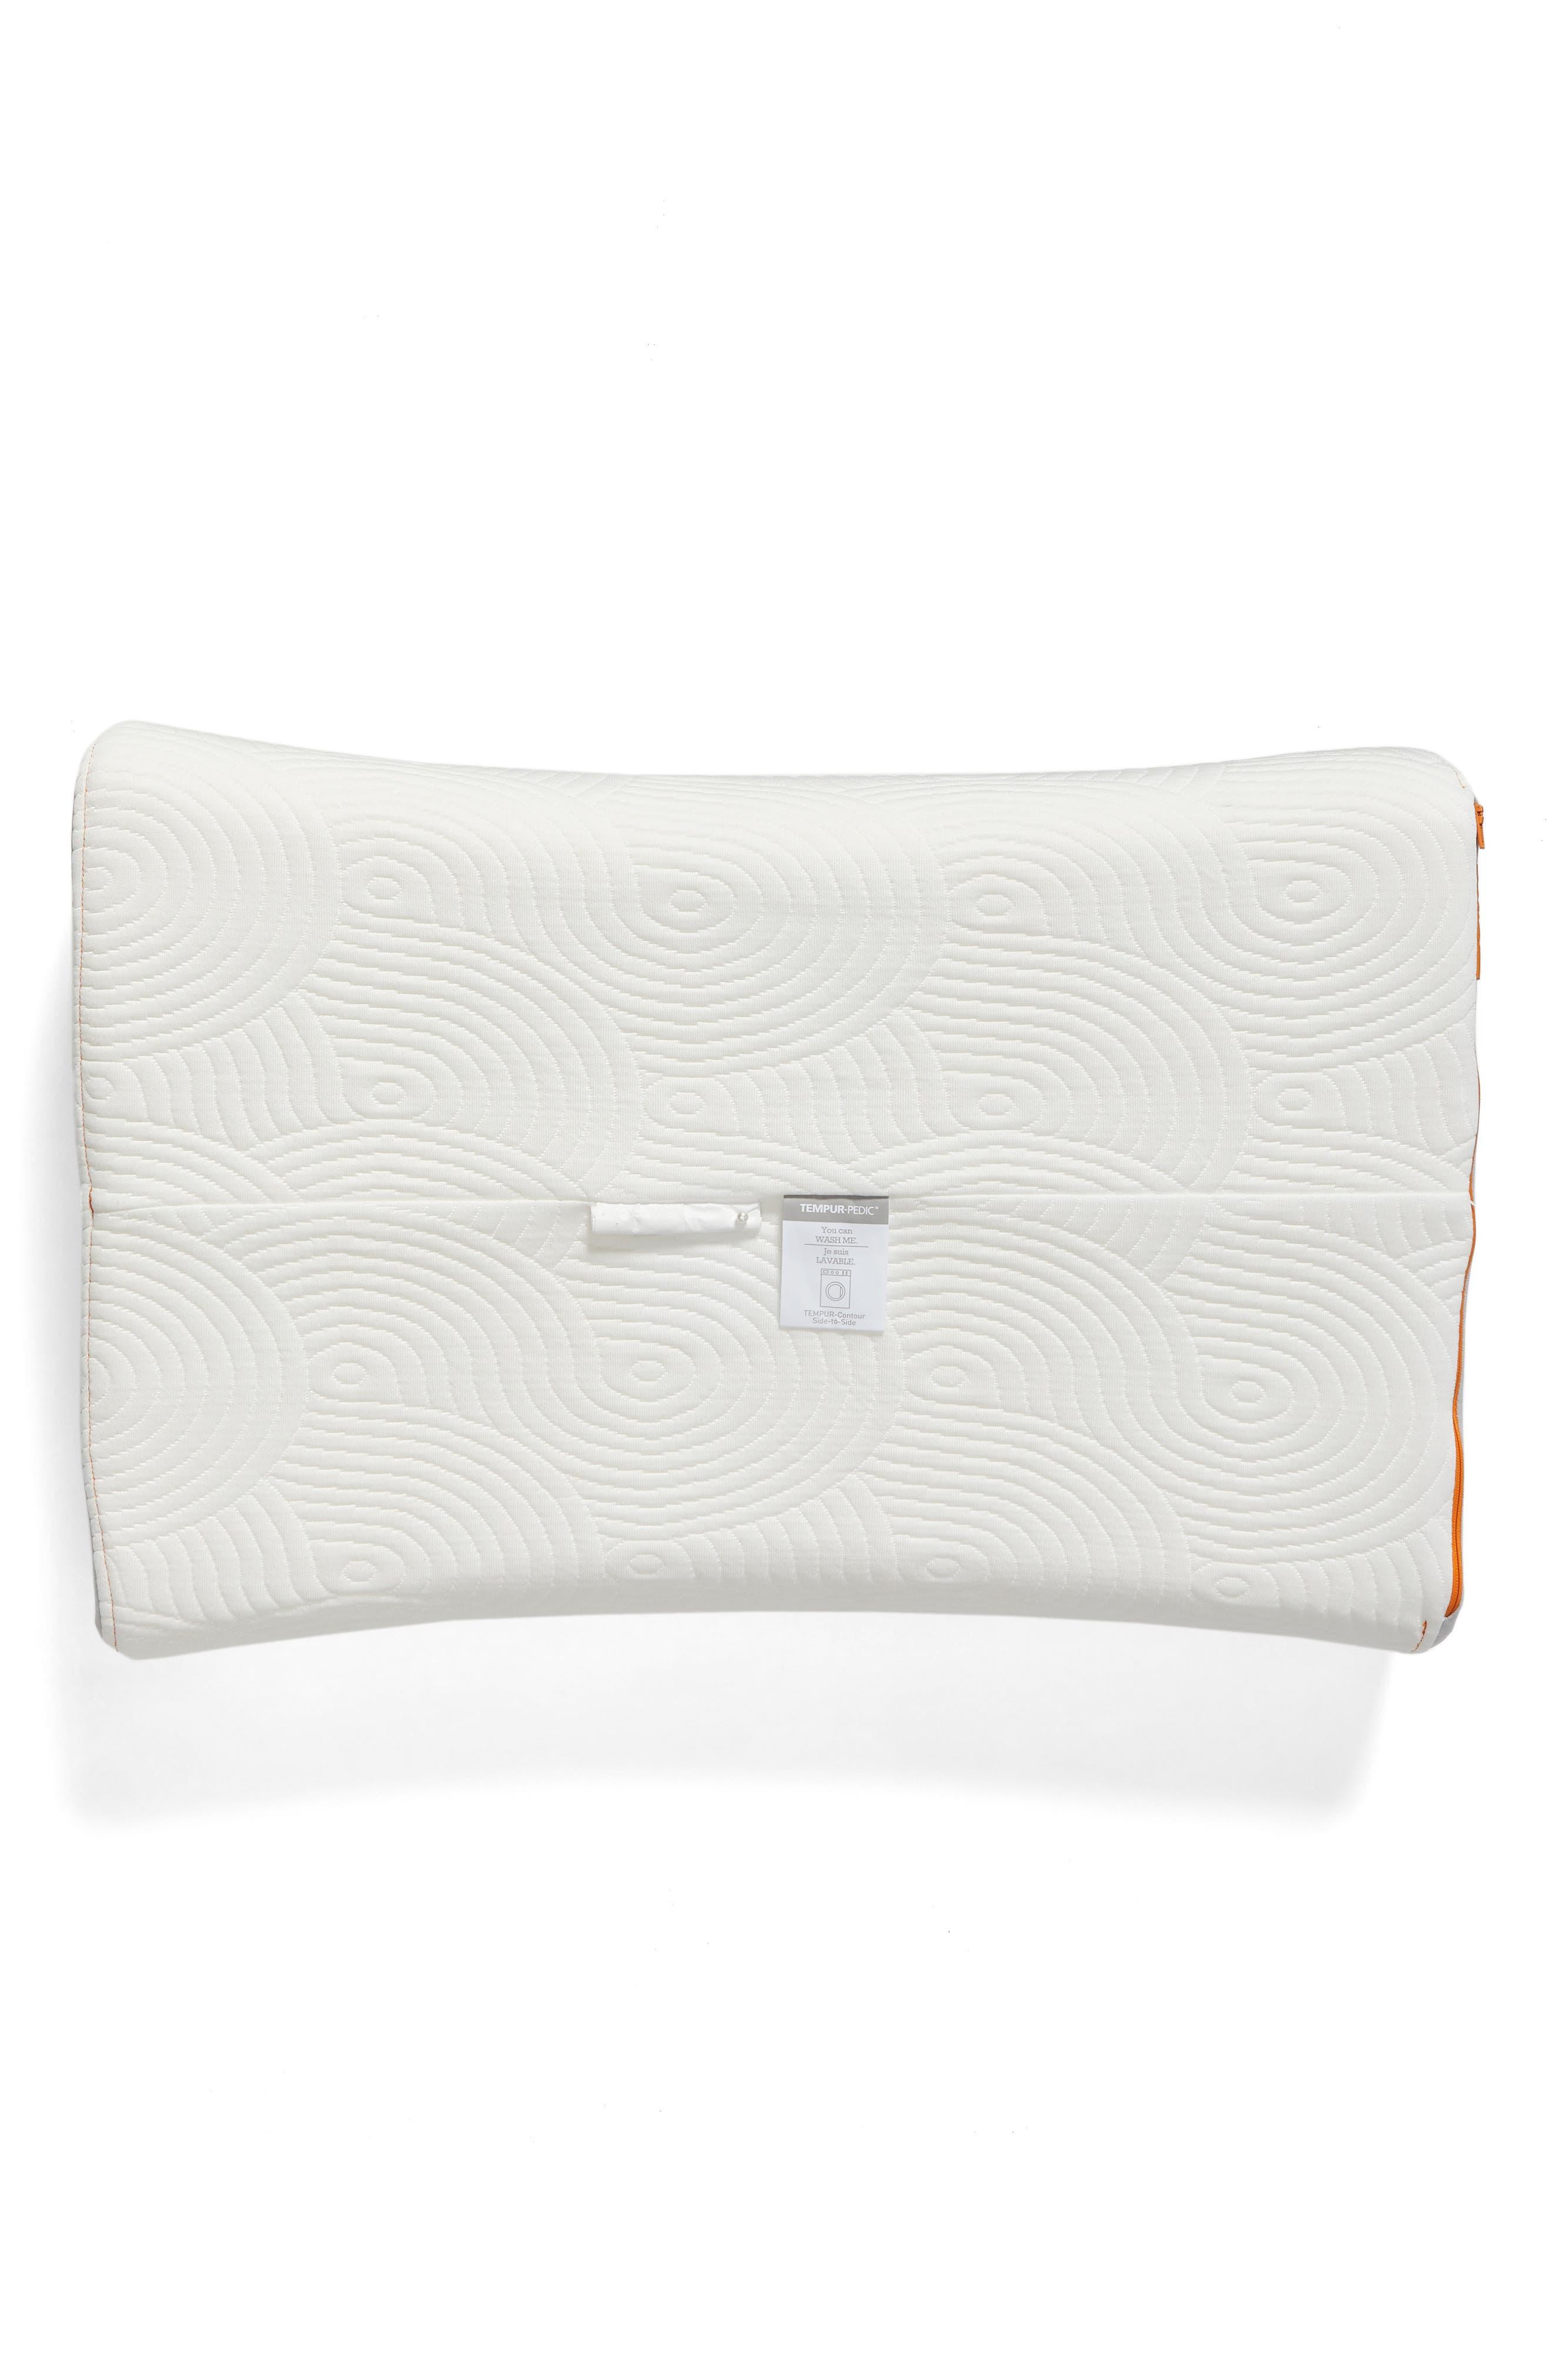 TEMPUR-Contour Side-to-Side Pillow,                             Alternate thumbnail 2, color,                             WHITE